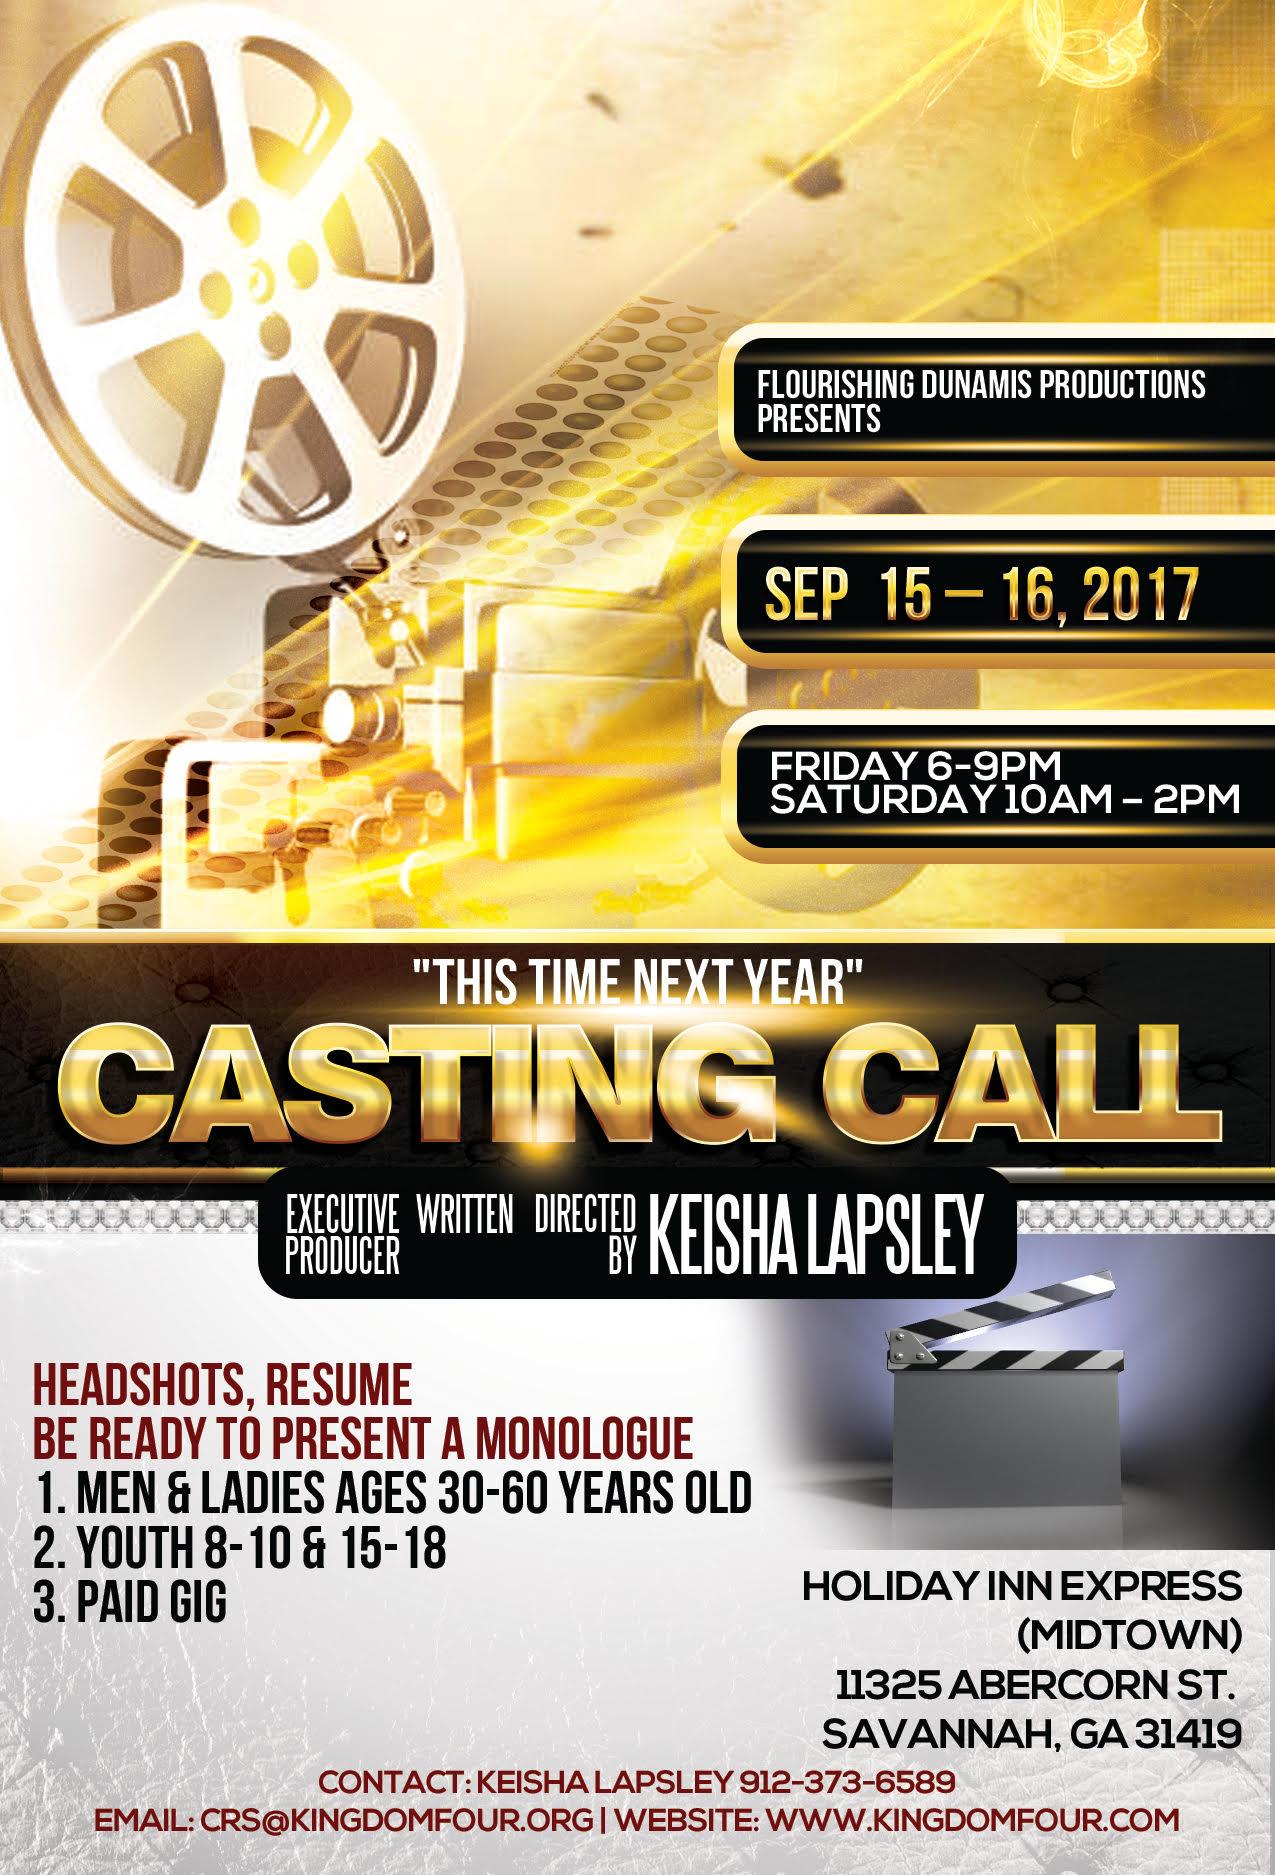 TTNY Casting Call Flyer